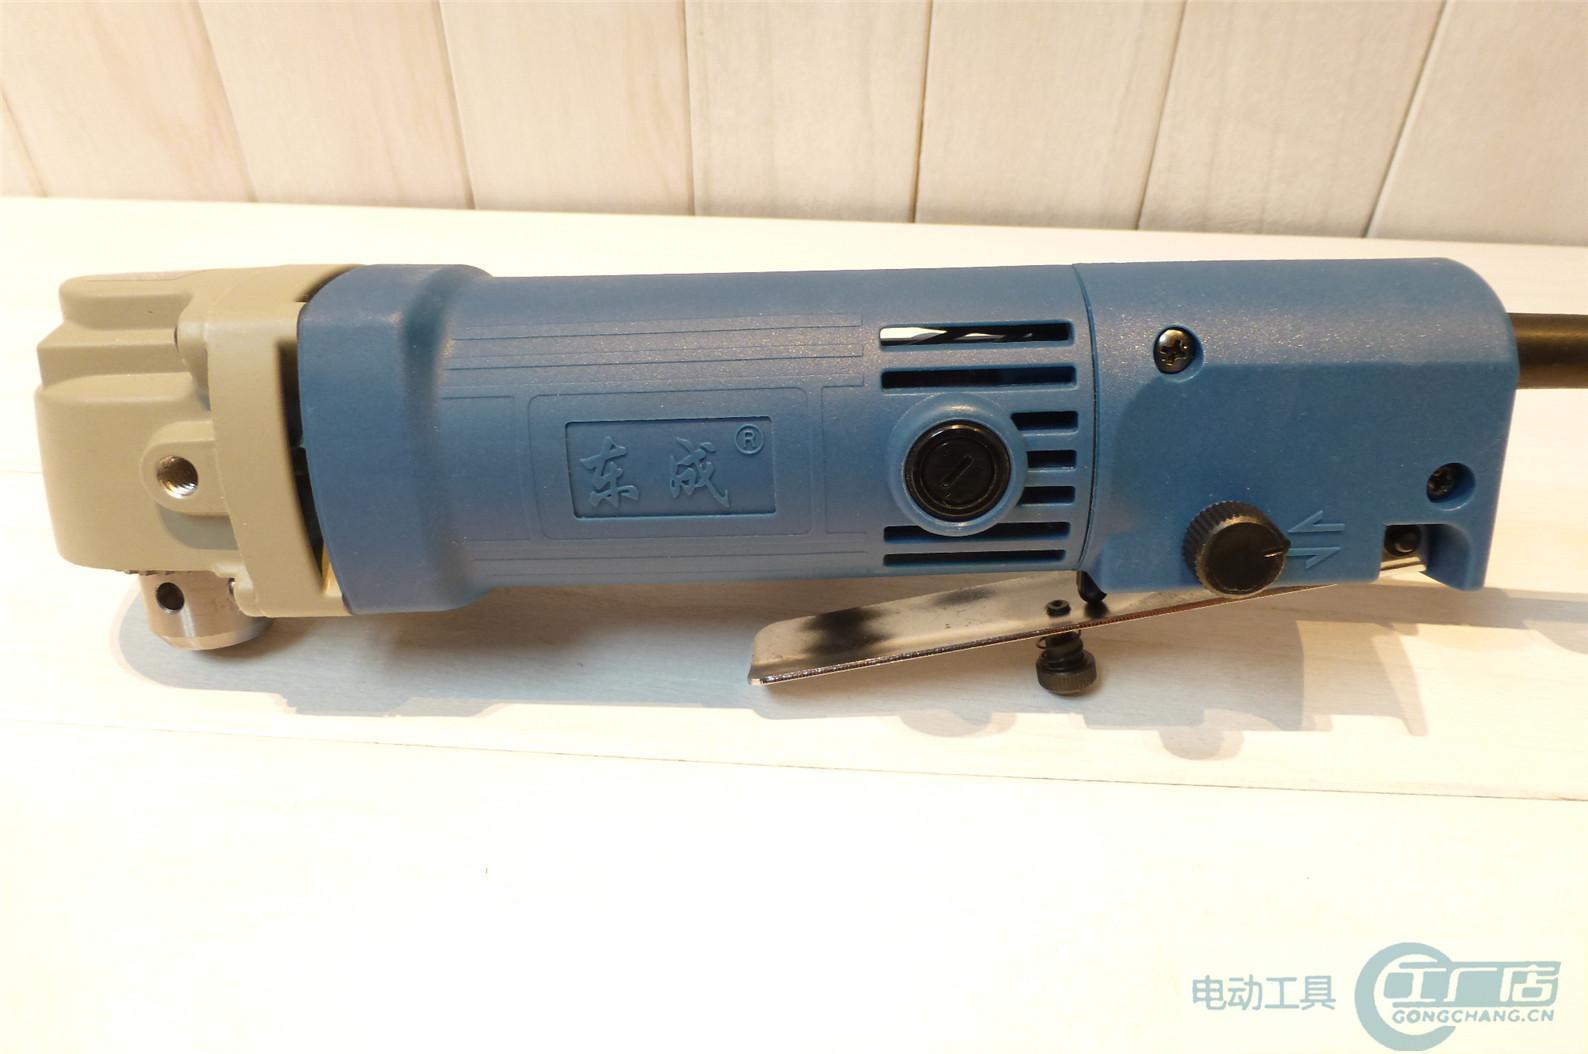 j1z-ff06-10角向电钻使用了气动类压板式调速开关